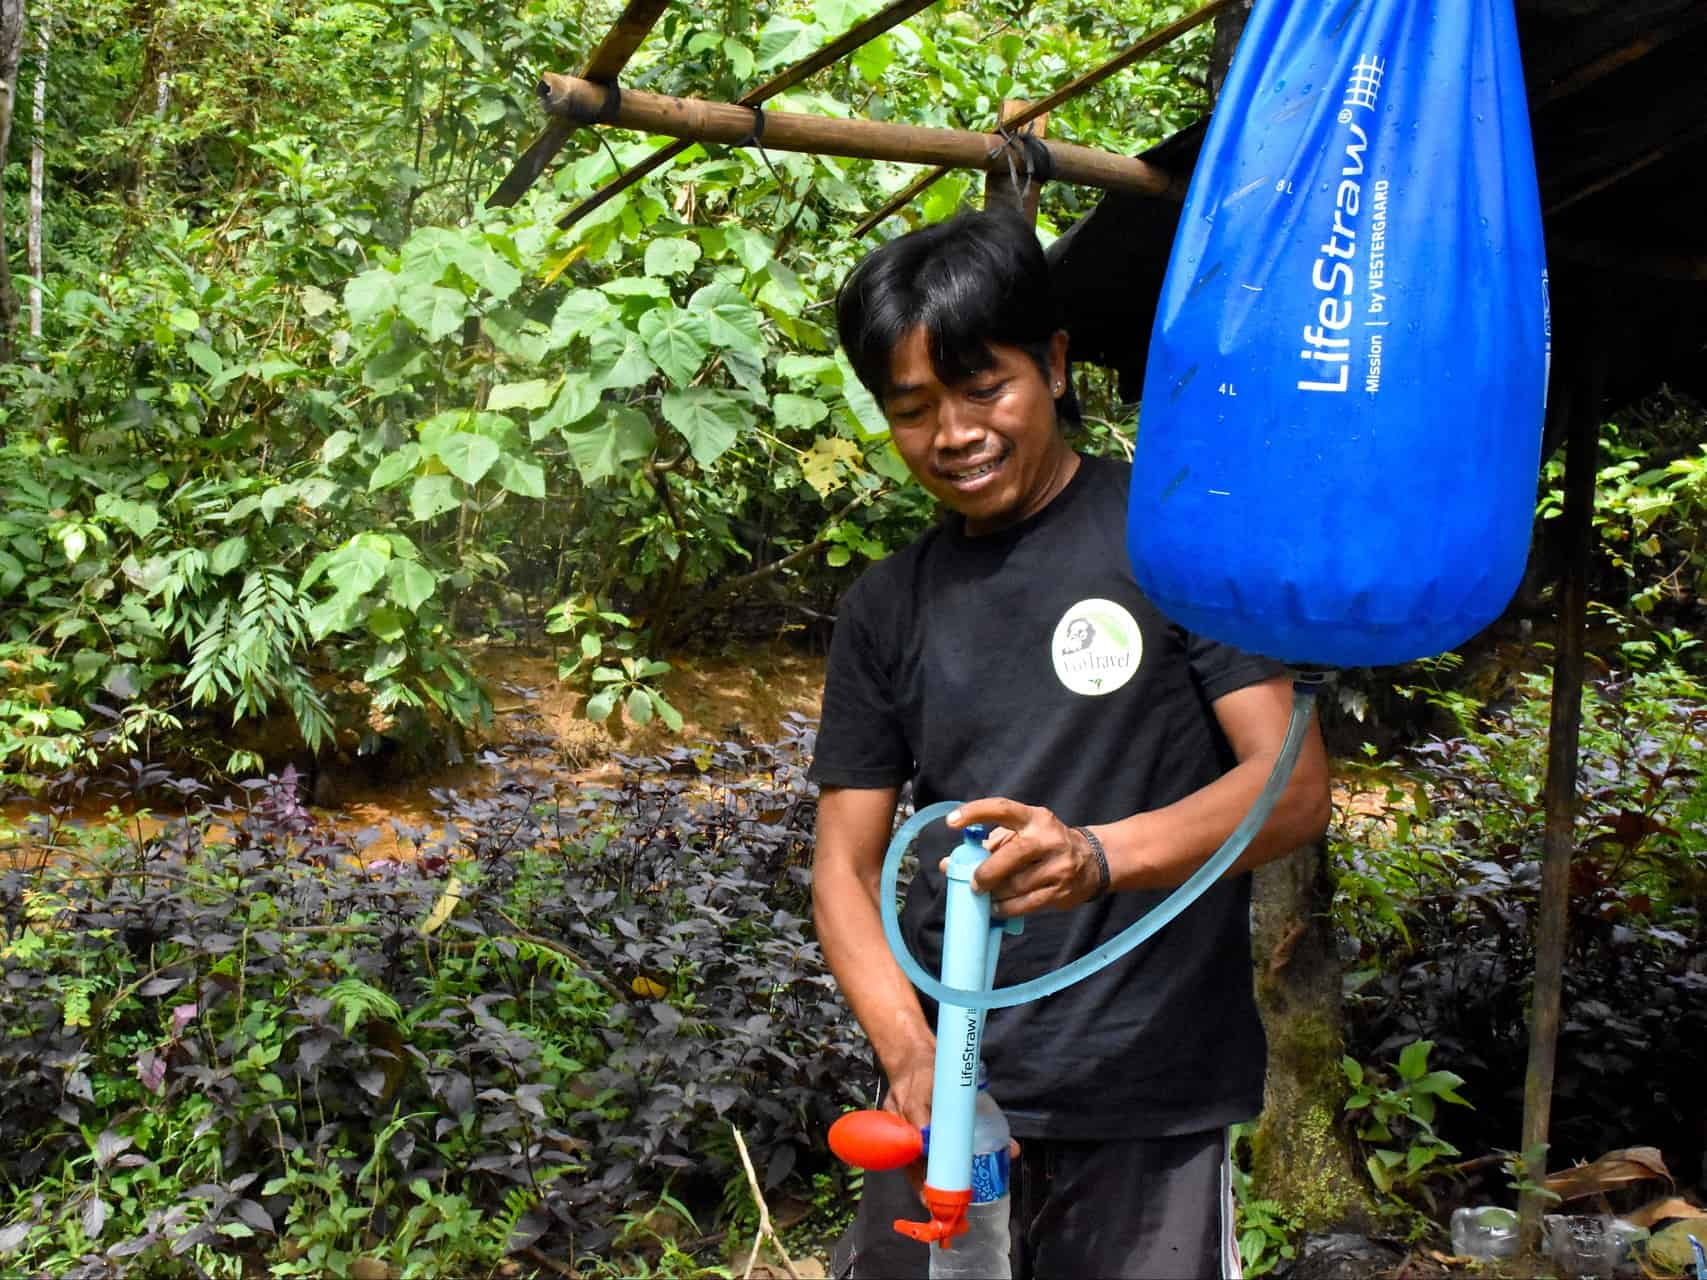 PLASTIC FREE - JUNGLE TREKKING - PURIFIED WATER - SUMATRA ECOTRAVEL BUKIT LAWANG